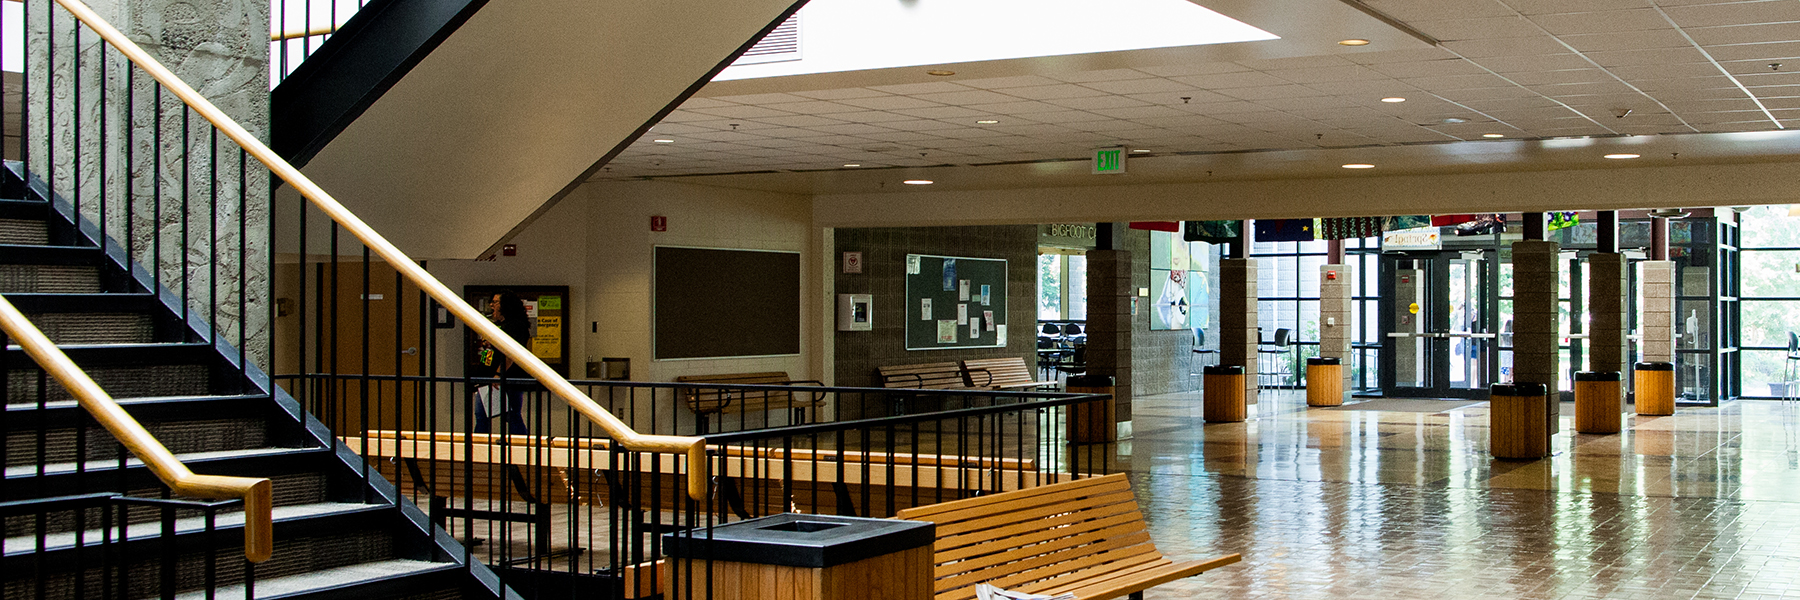 SCC Lair Student Center